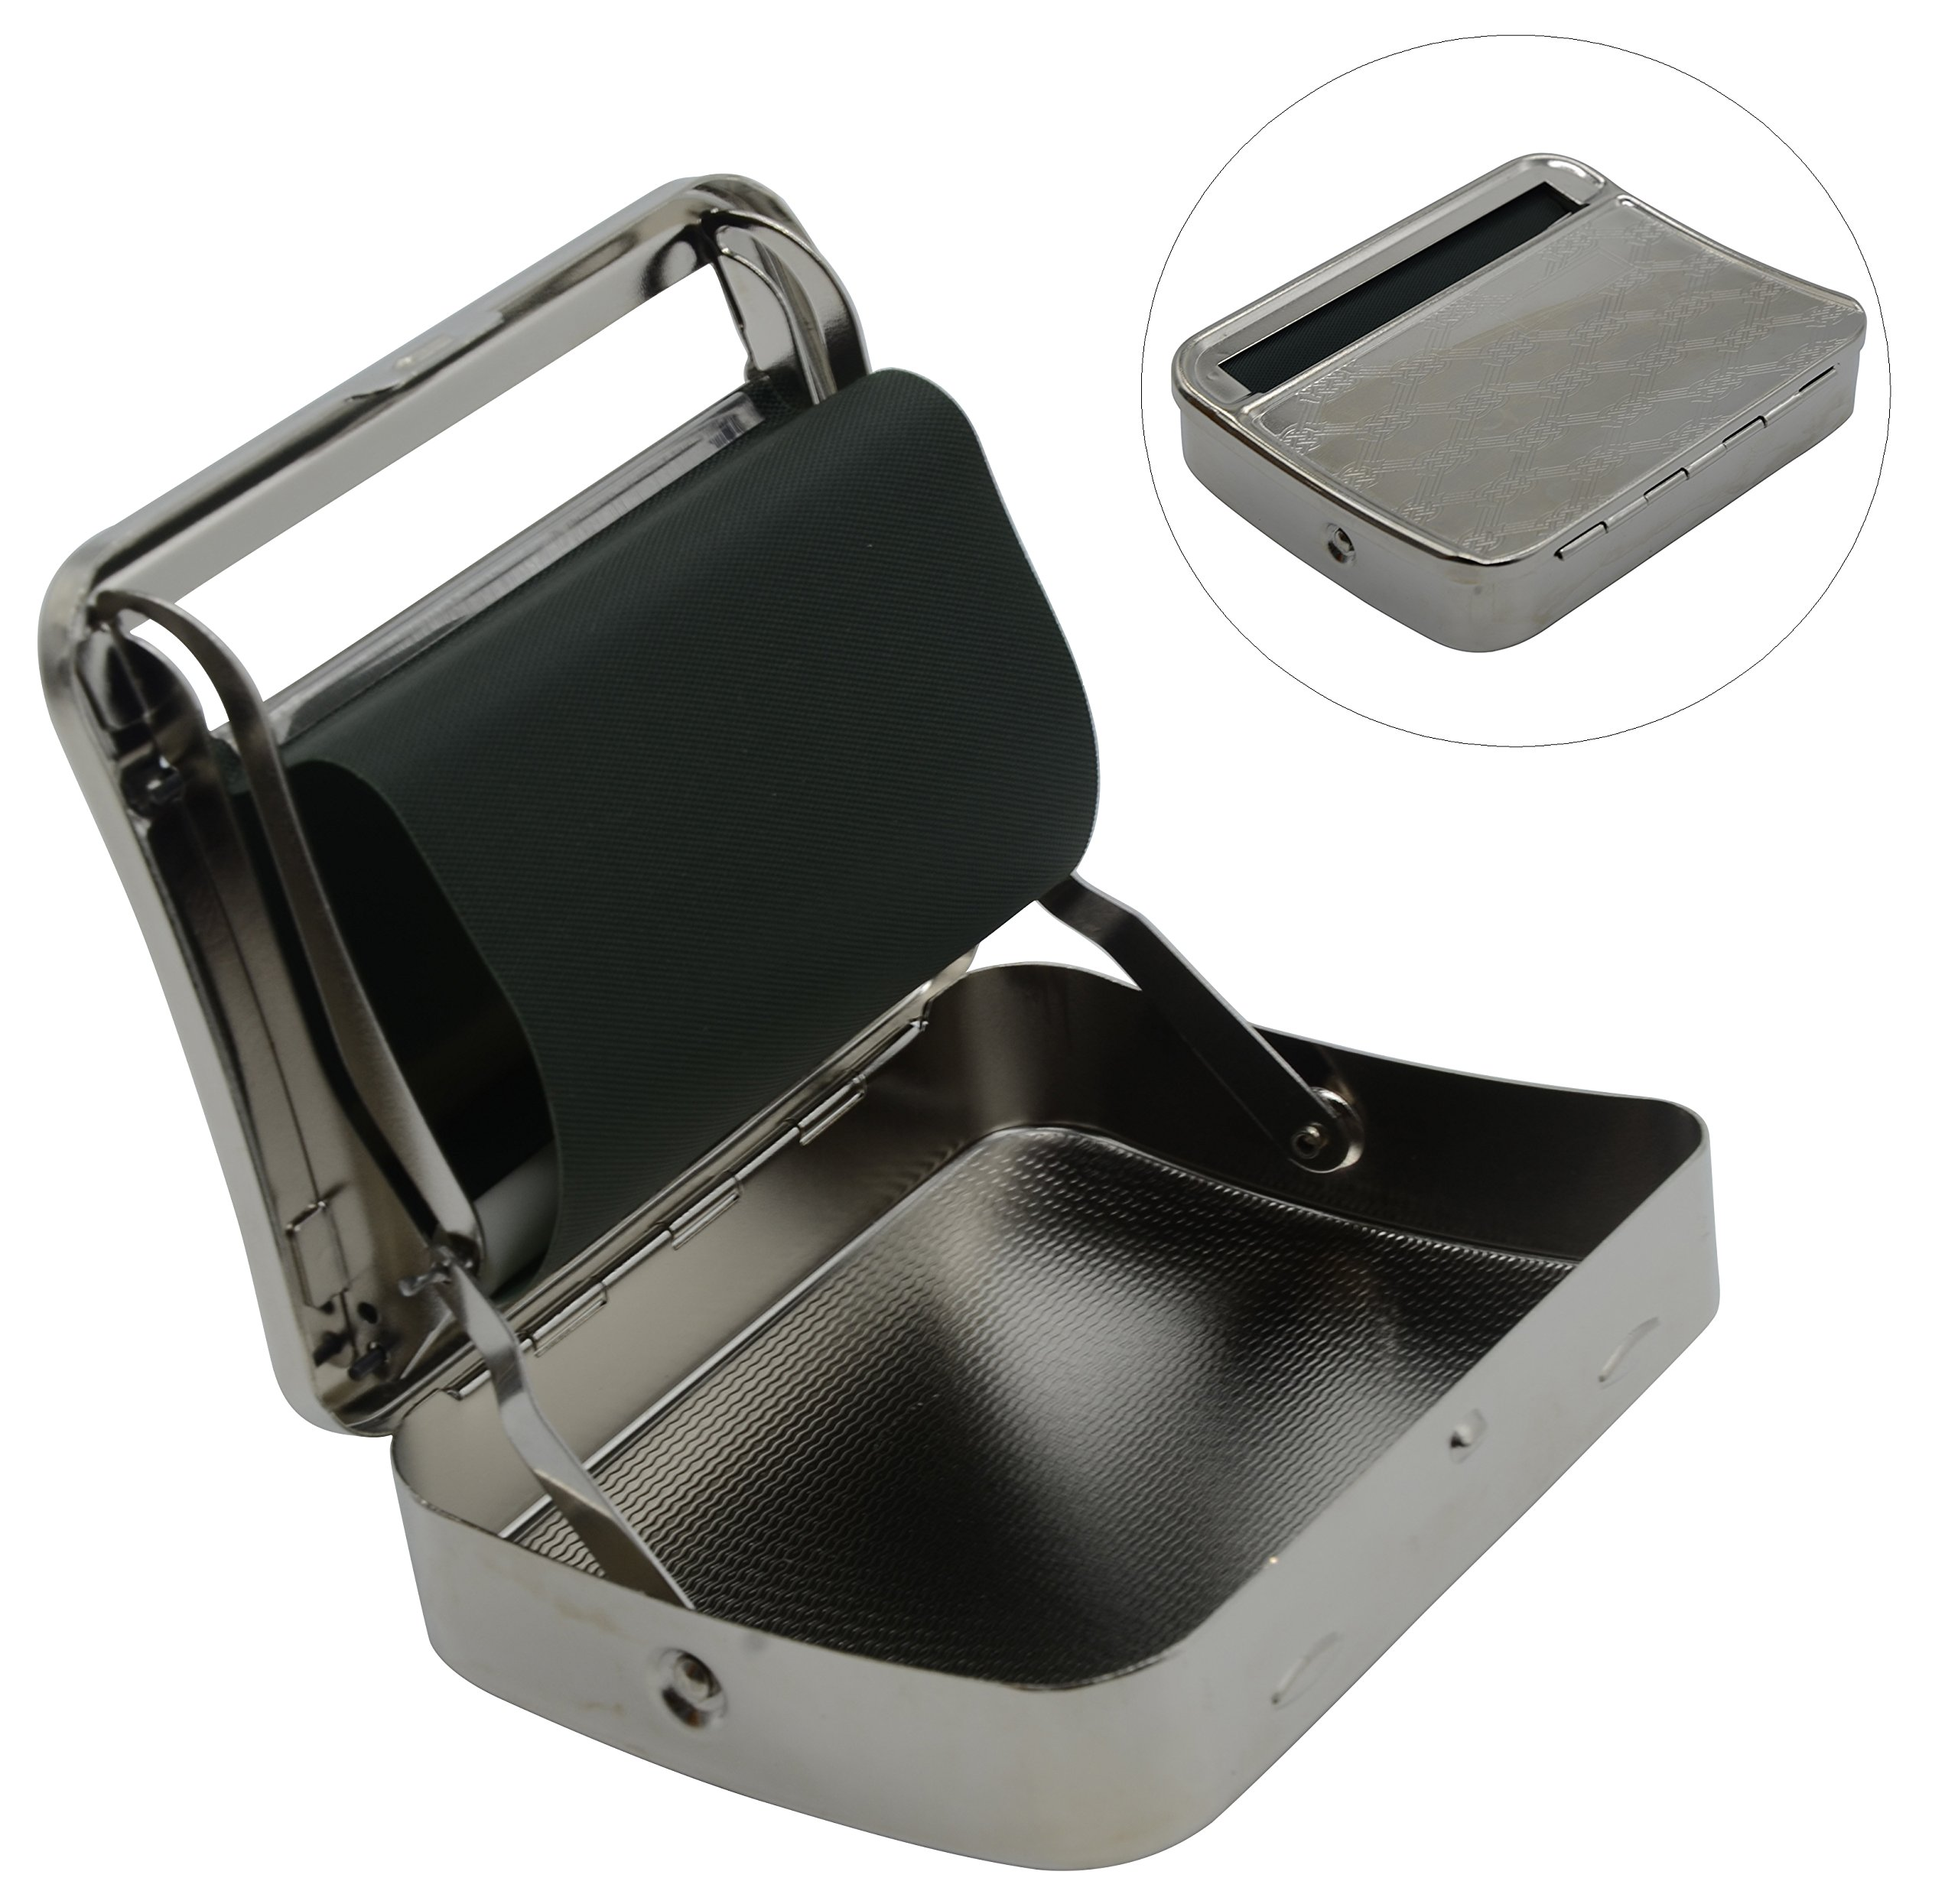 LeRich New Arrival Metal Automatic Cigarette Tobacco Roller Roll Rolling Machine Box Case Tin & Storage Box